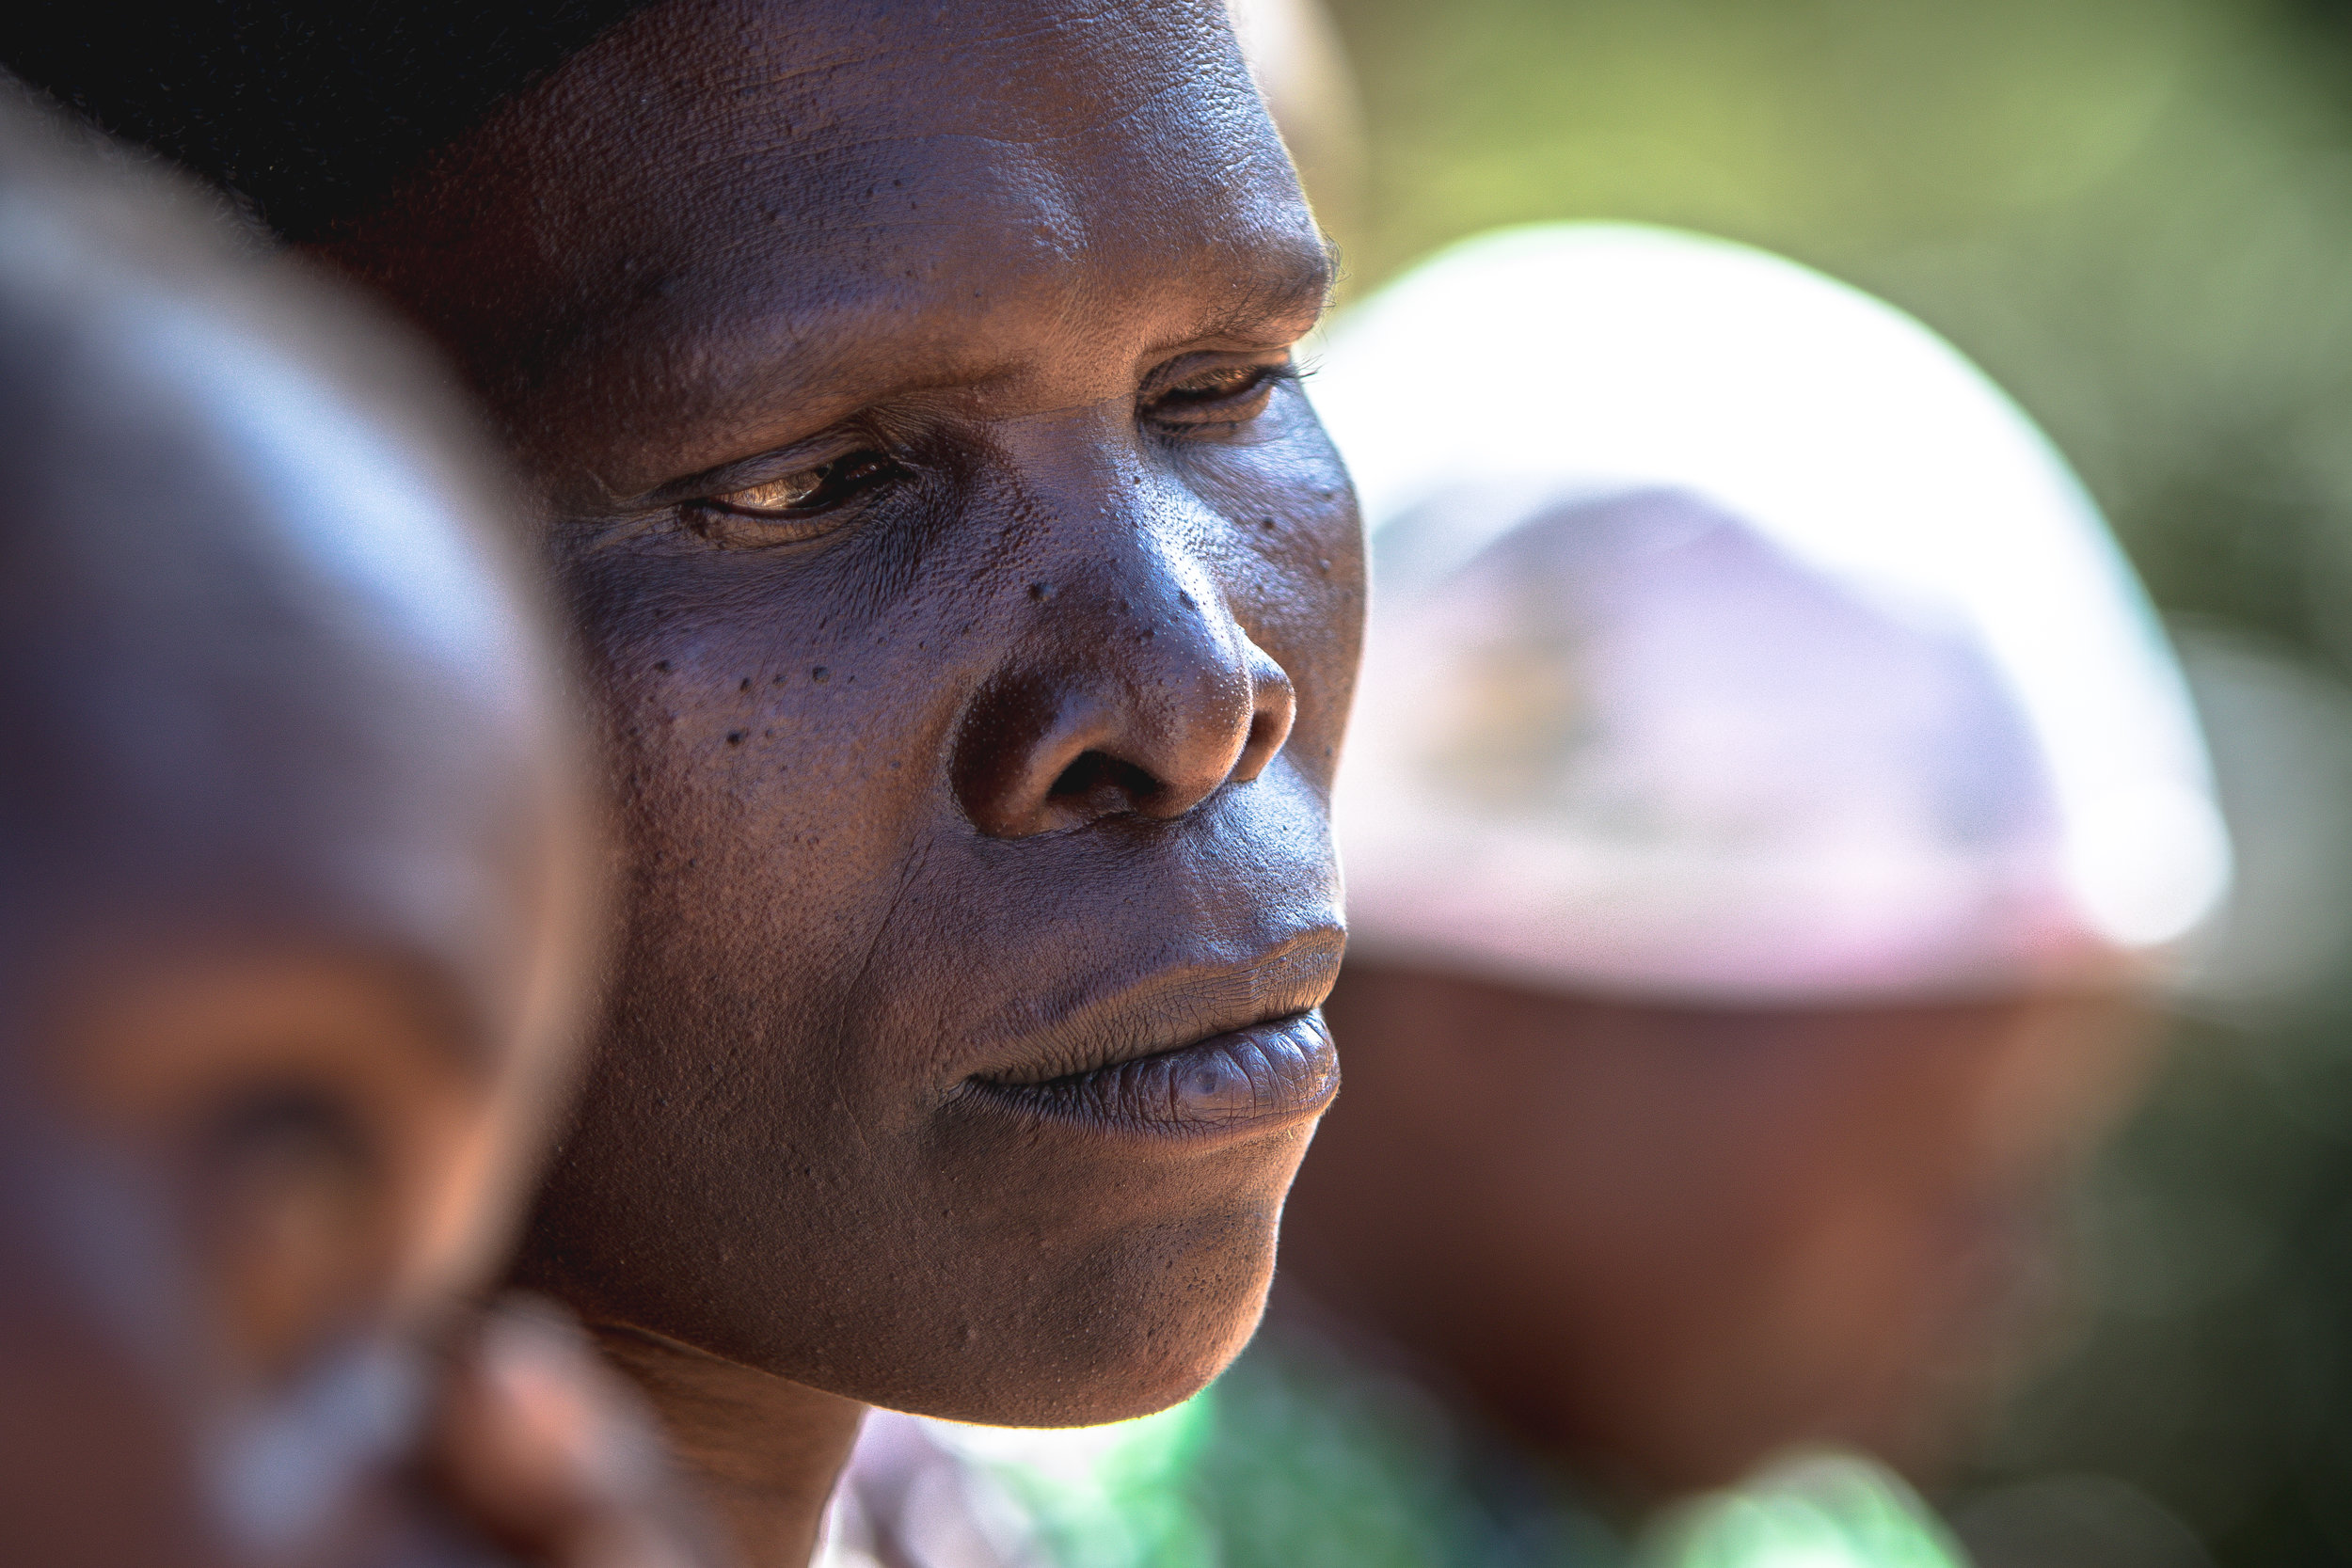 Adam Dickens Photography Malawi 2015 - 7754.jpg